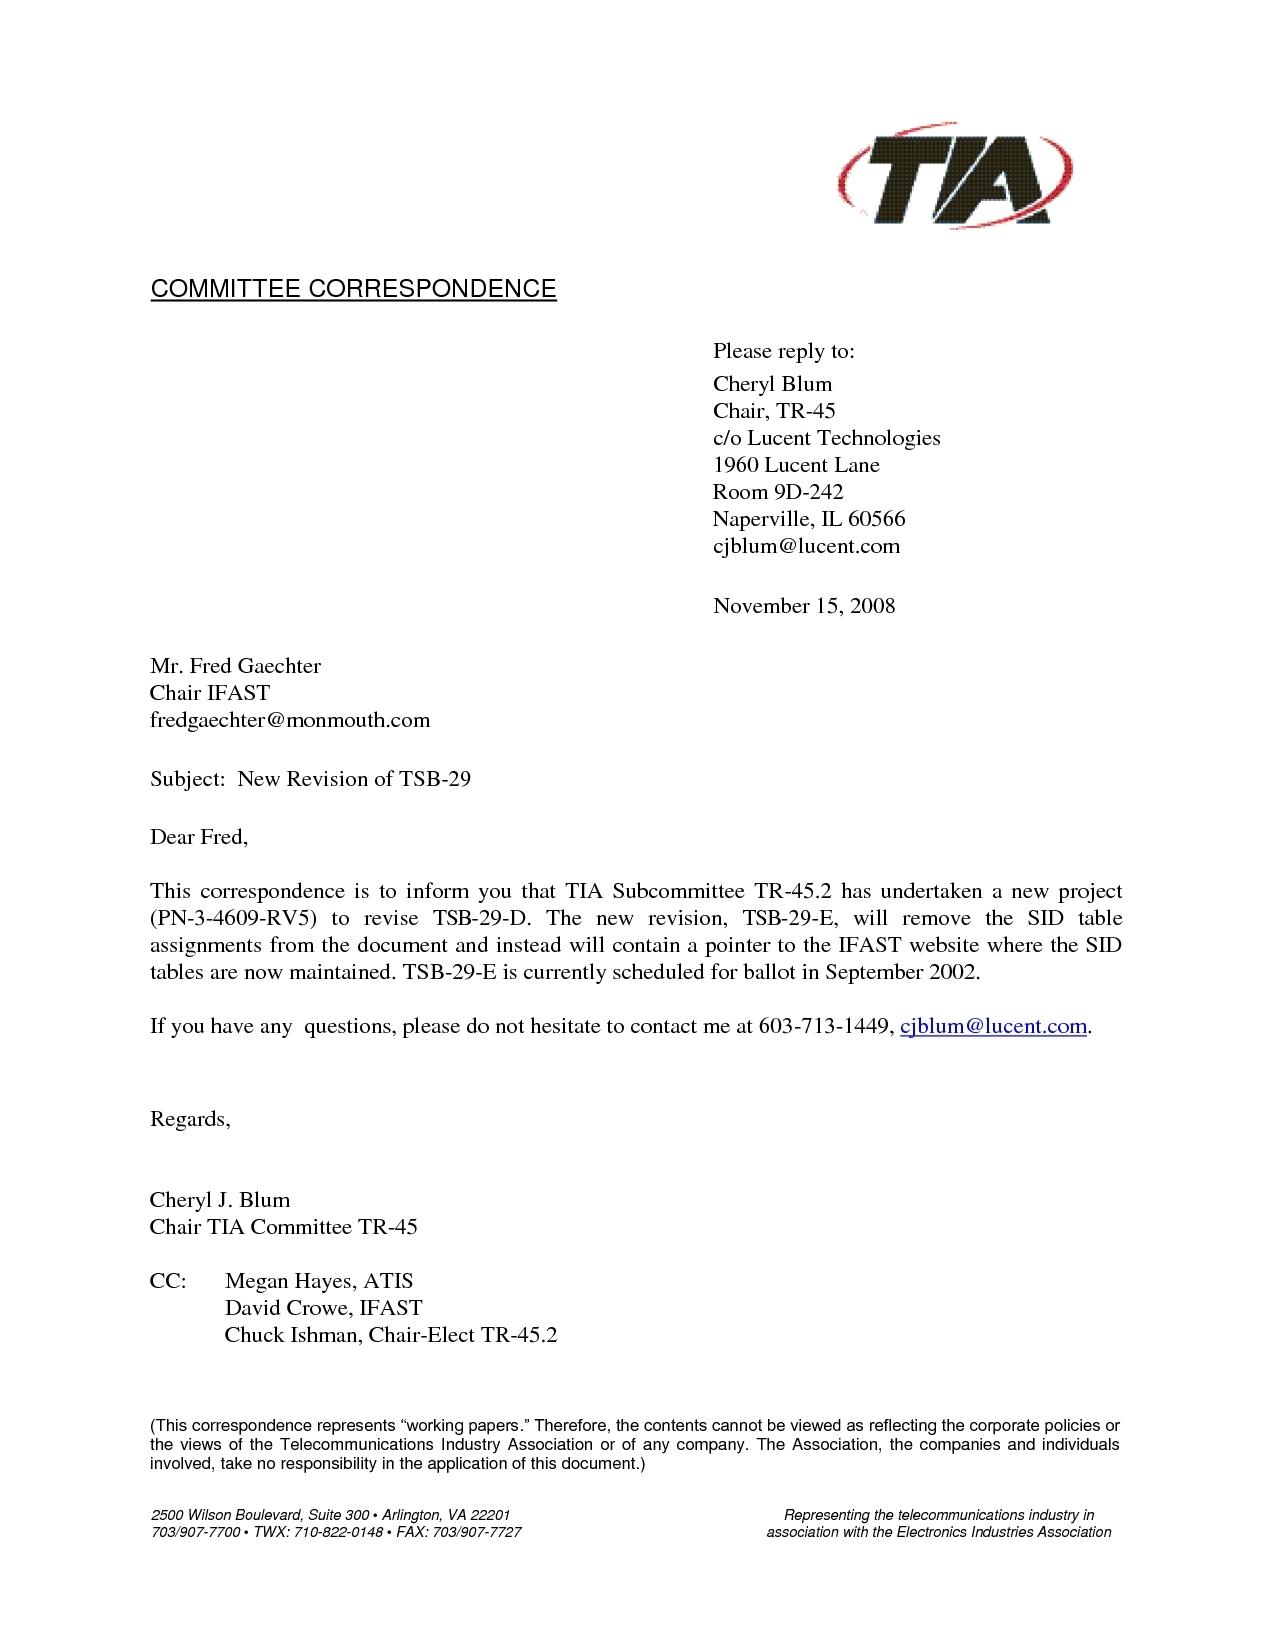 letter template with cc  Cc Business Letter Example | Letters – Free Sample Letters - letter template with cc